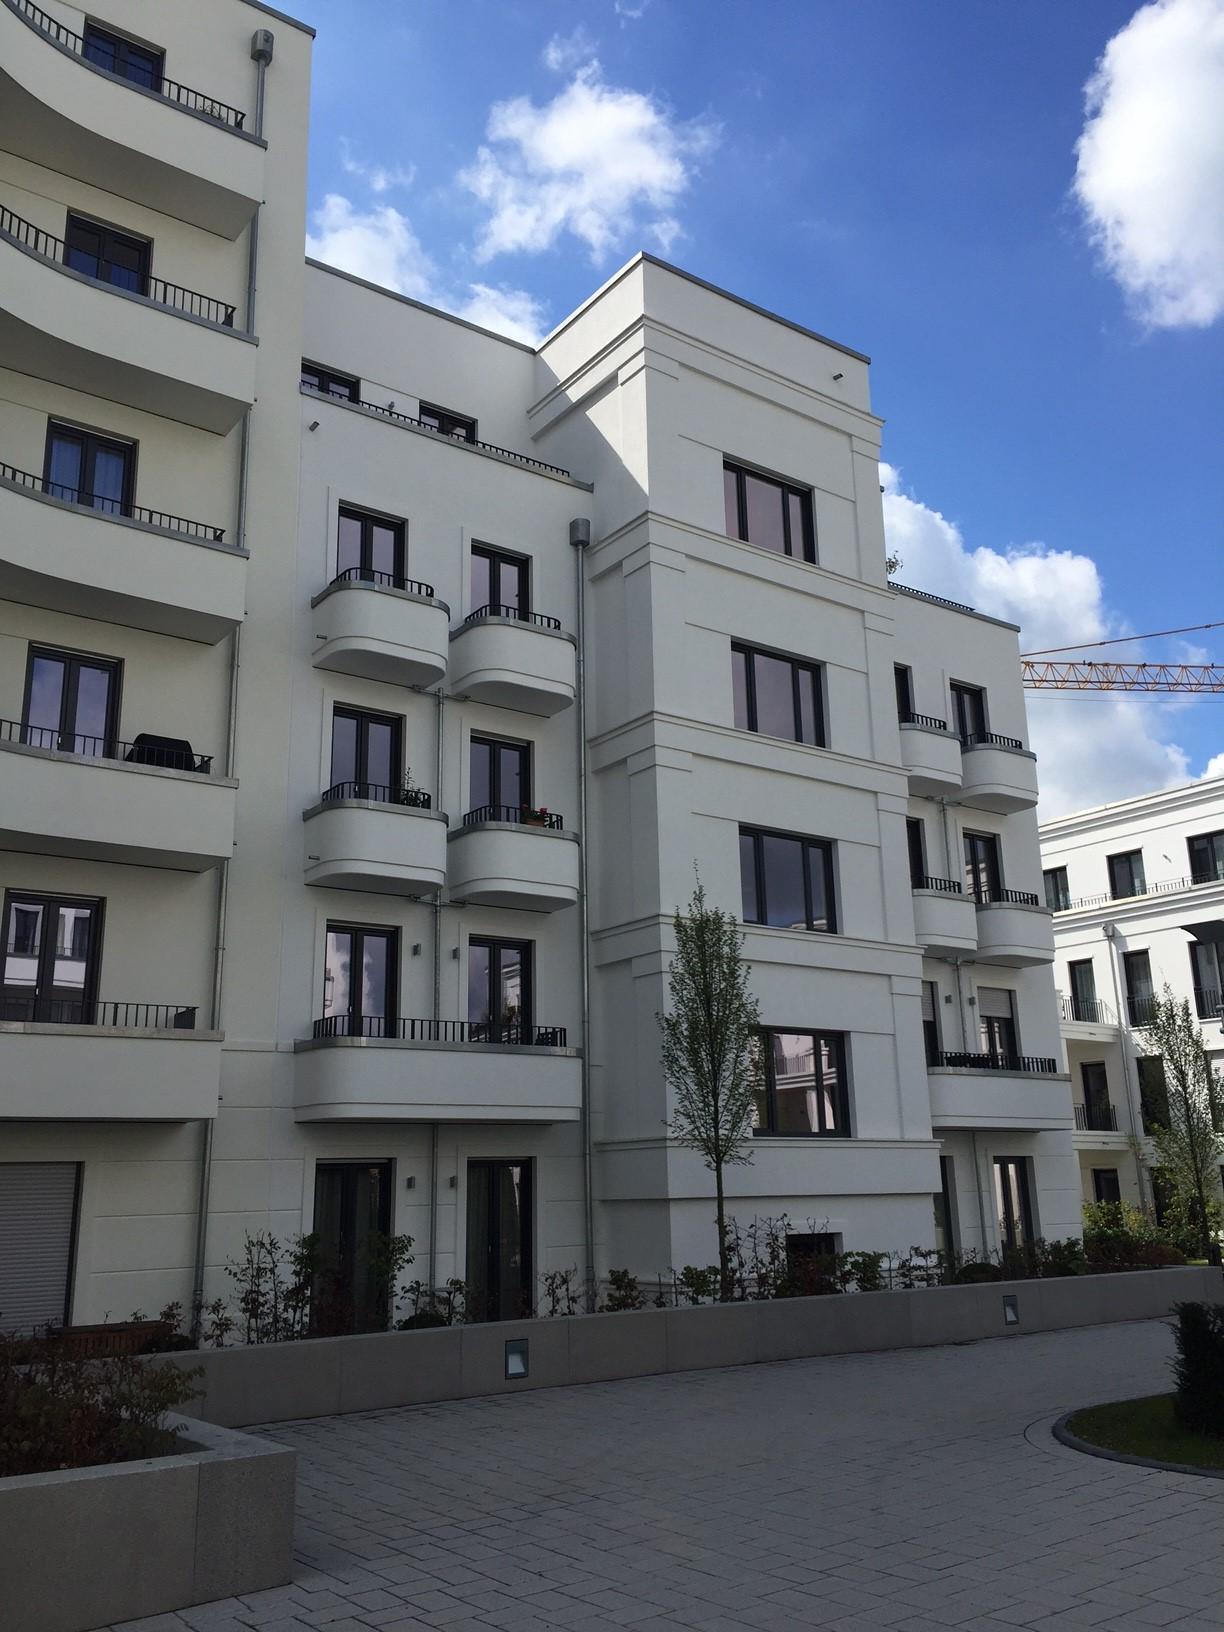 LeFlair, Düsseldorf